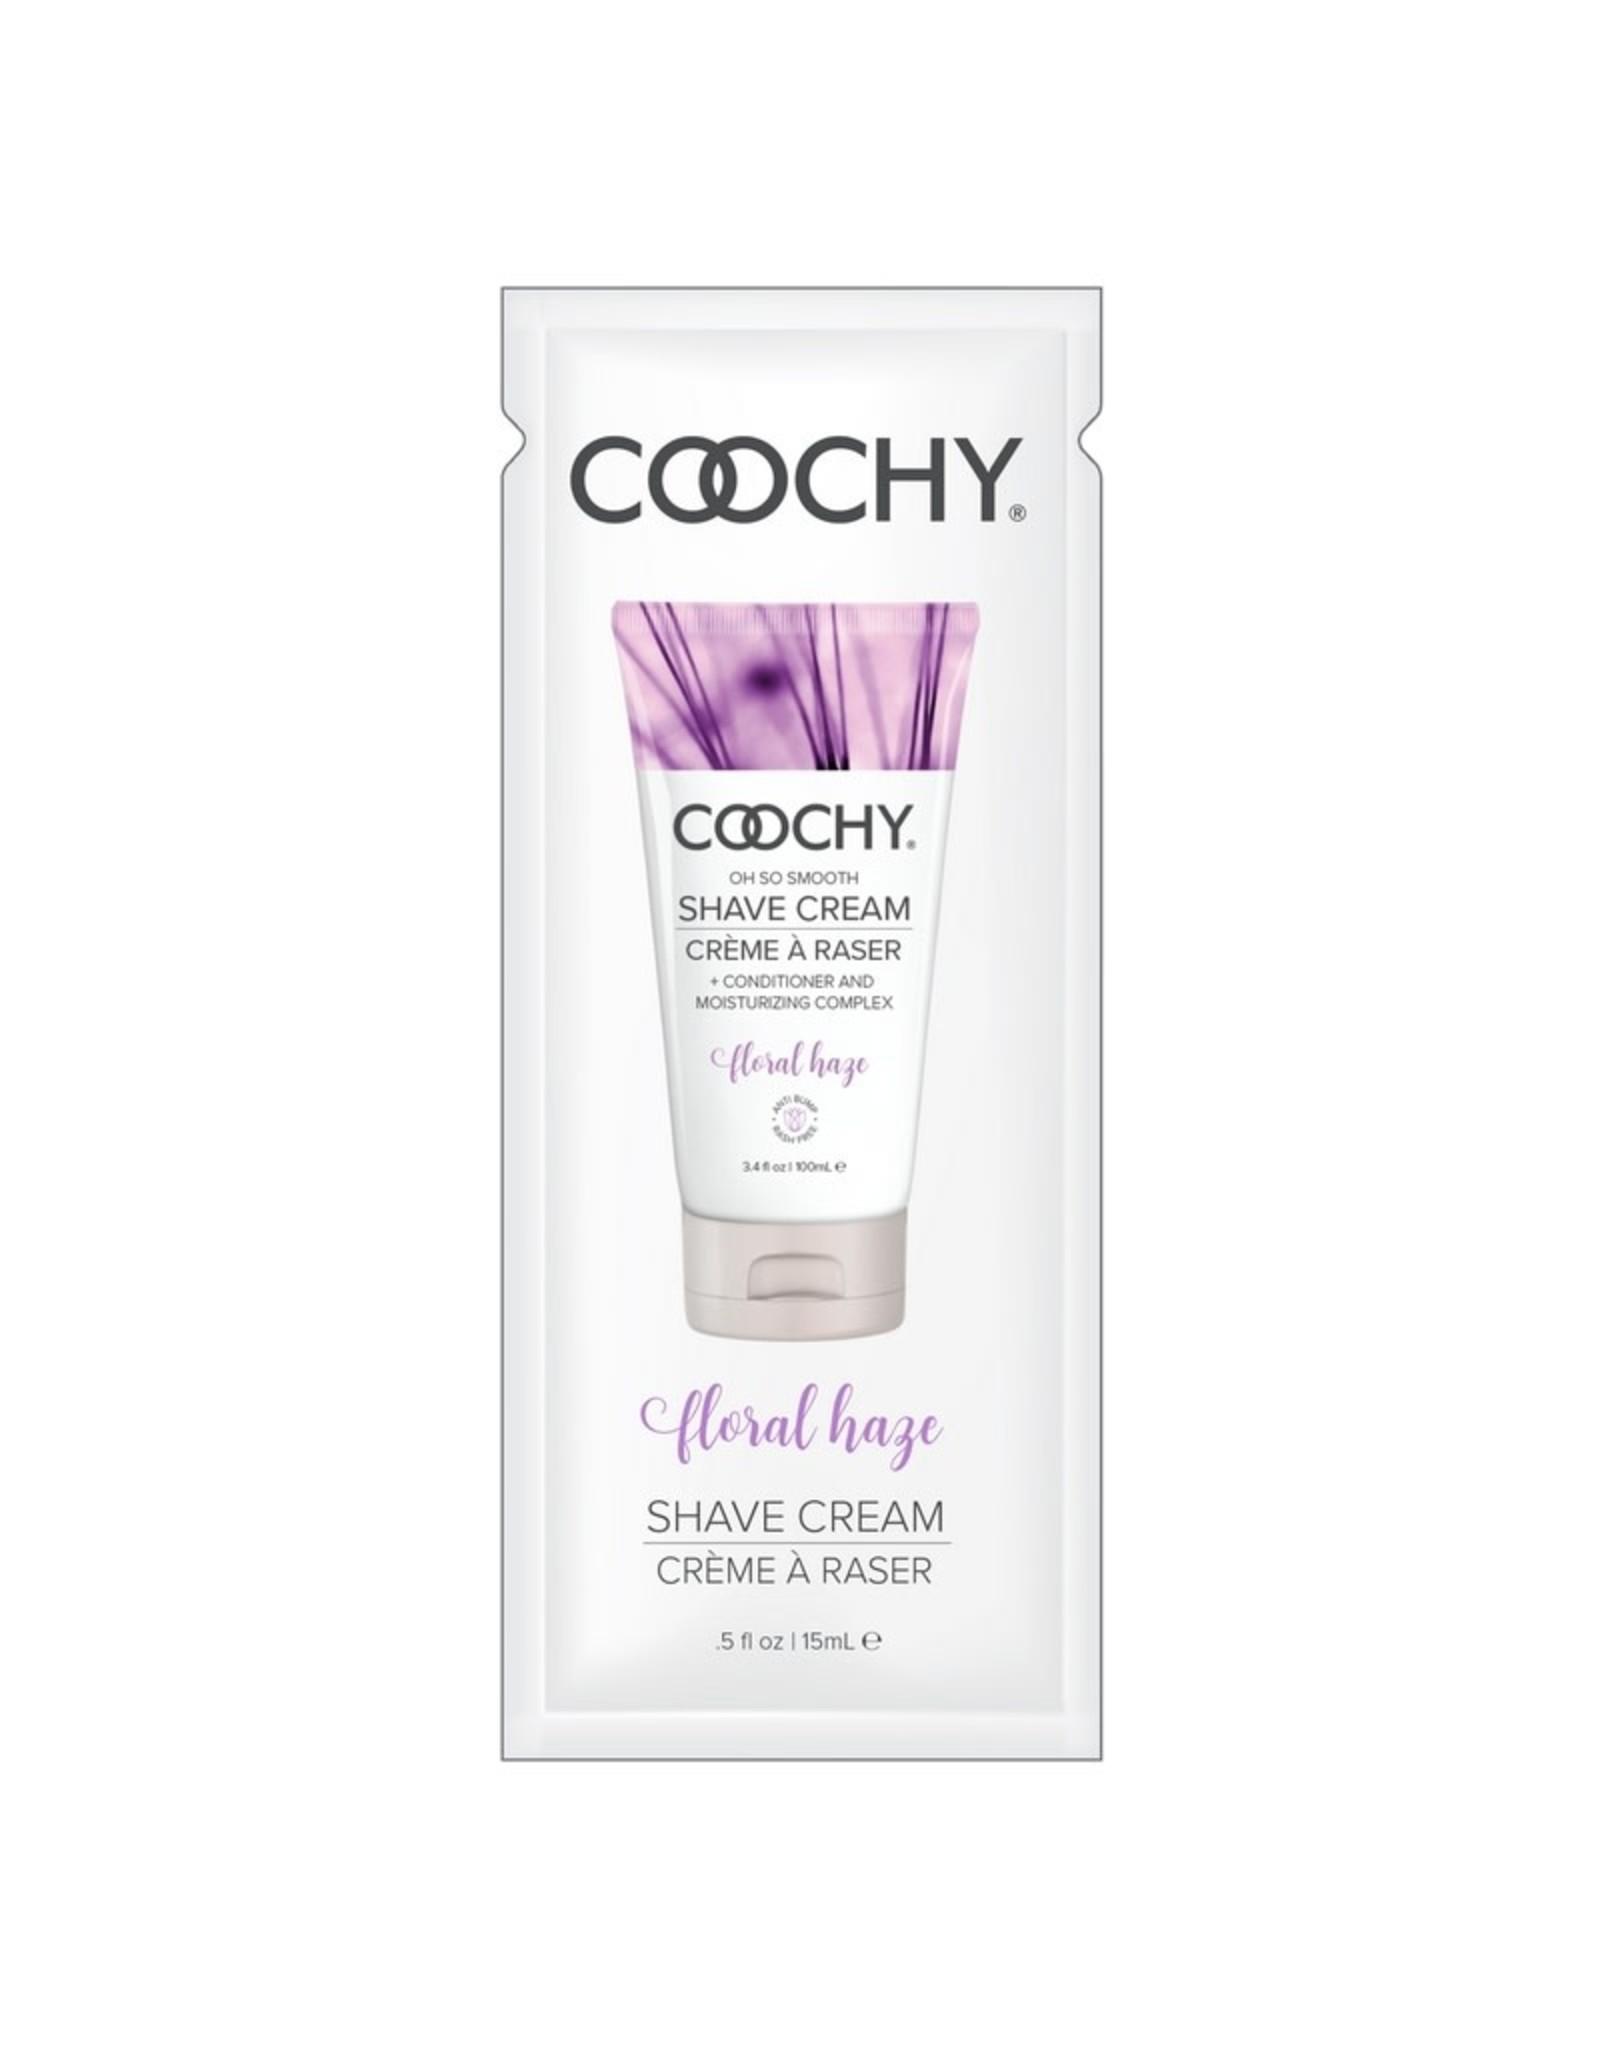 Coochy Coochy Foil - Floral Haze - 15ml